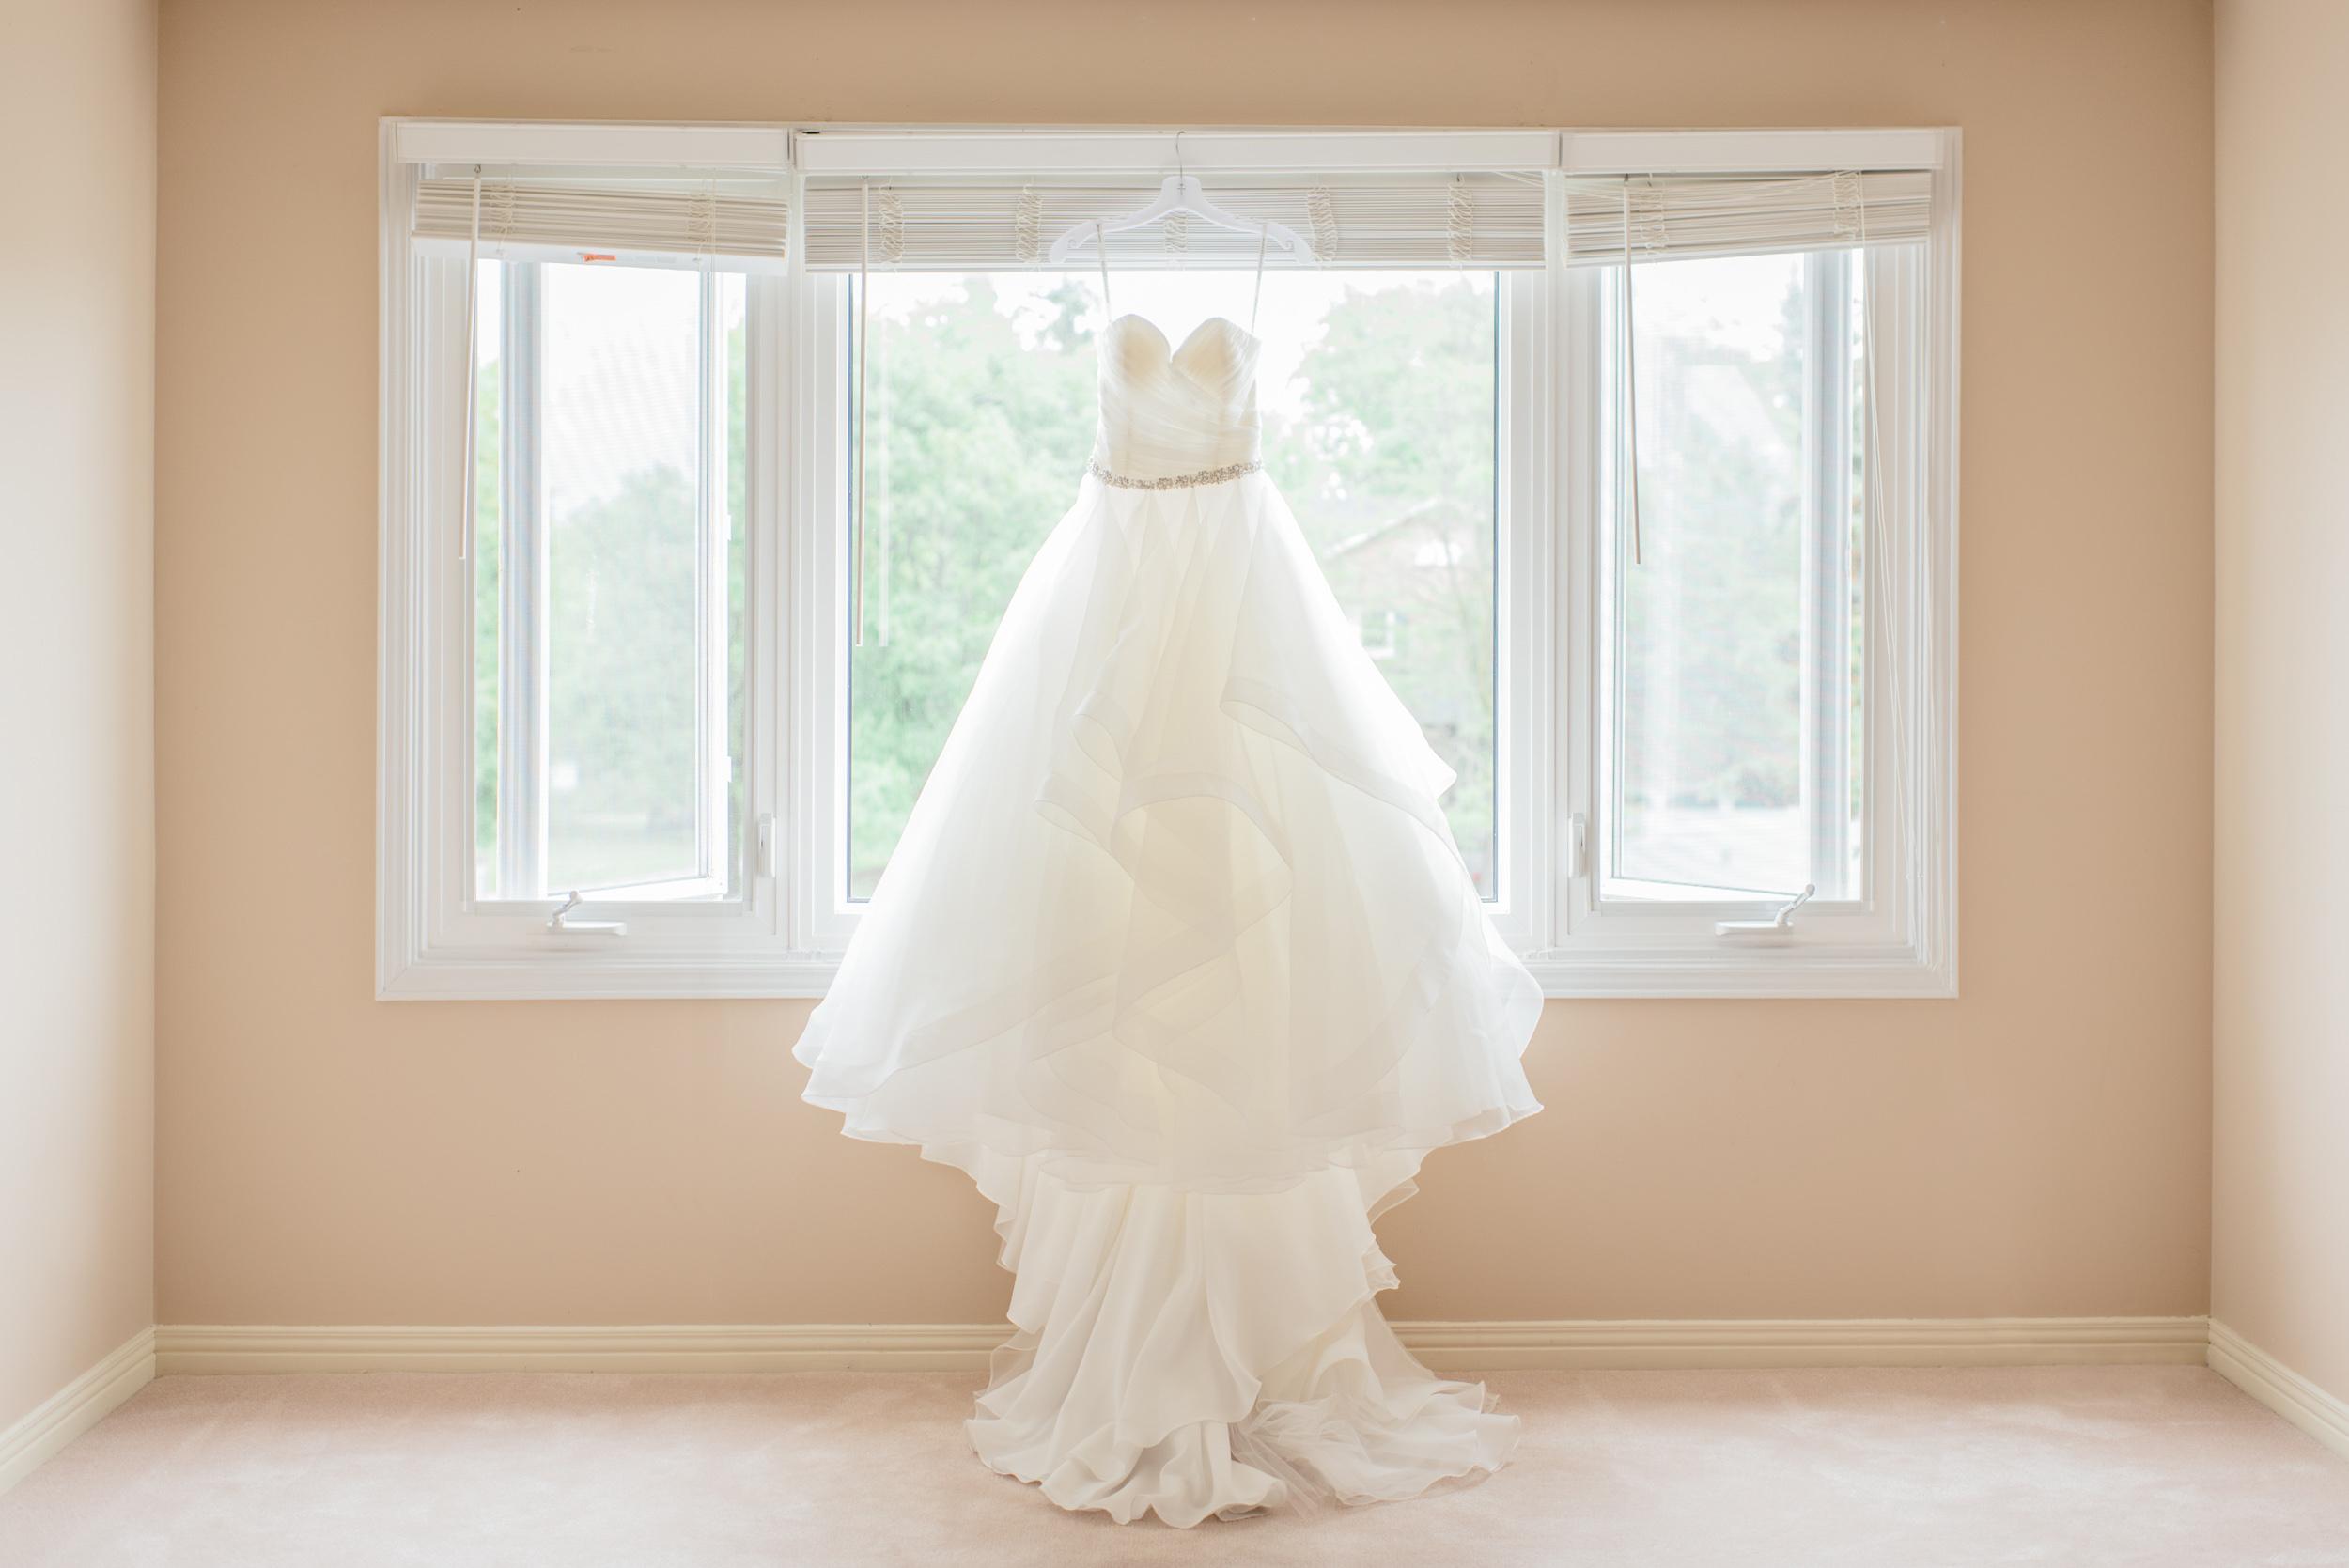 knox-college-wedding-5.jpg